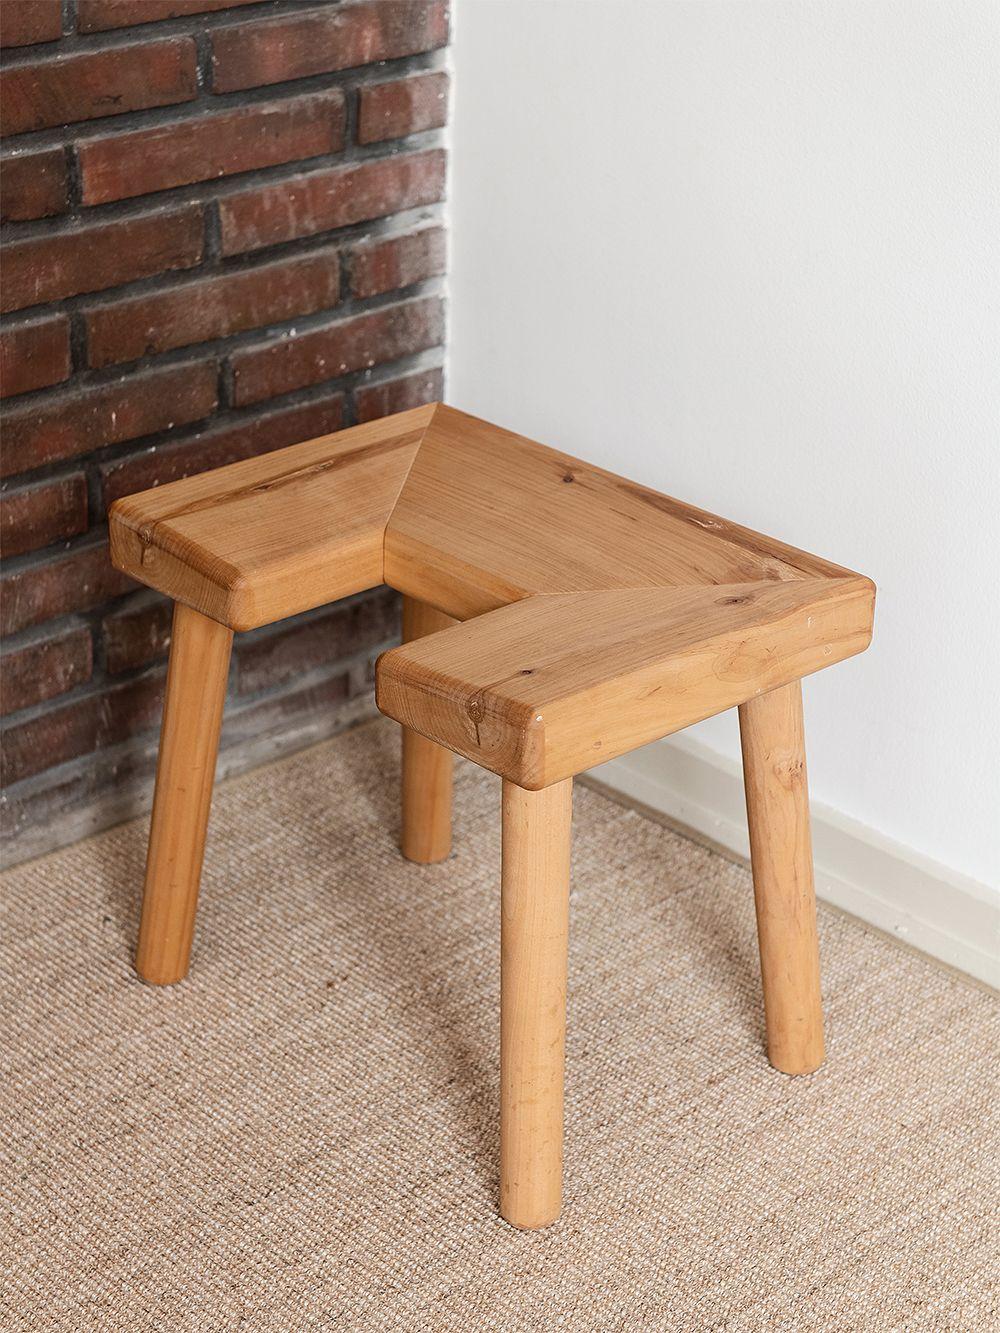 Nikari Culture Sauna stool